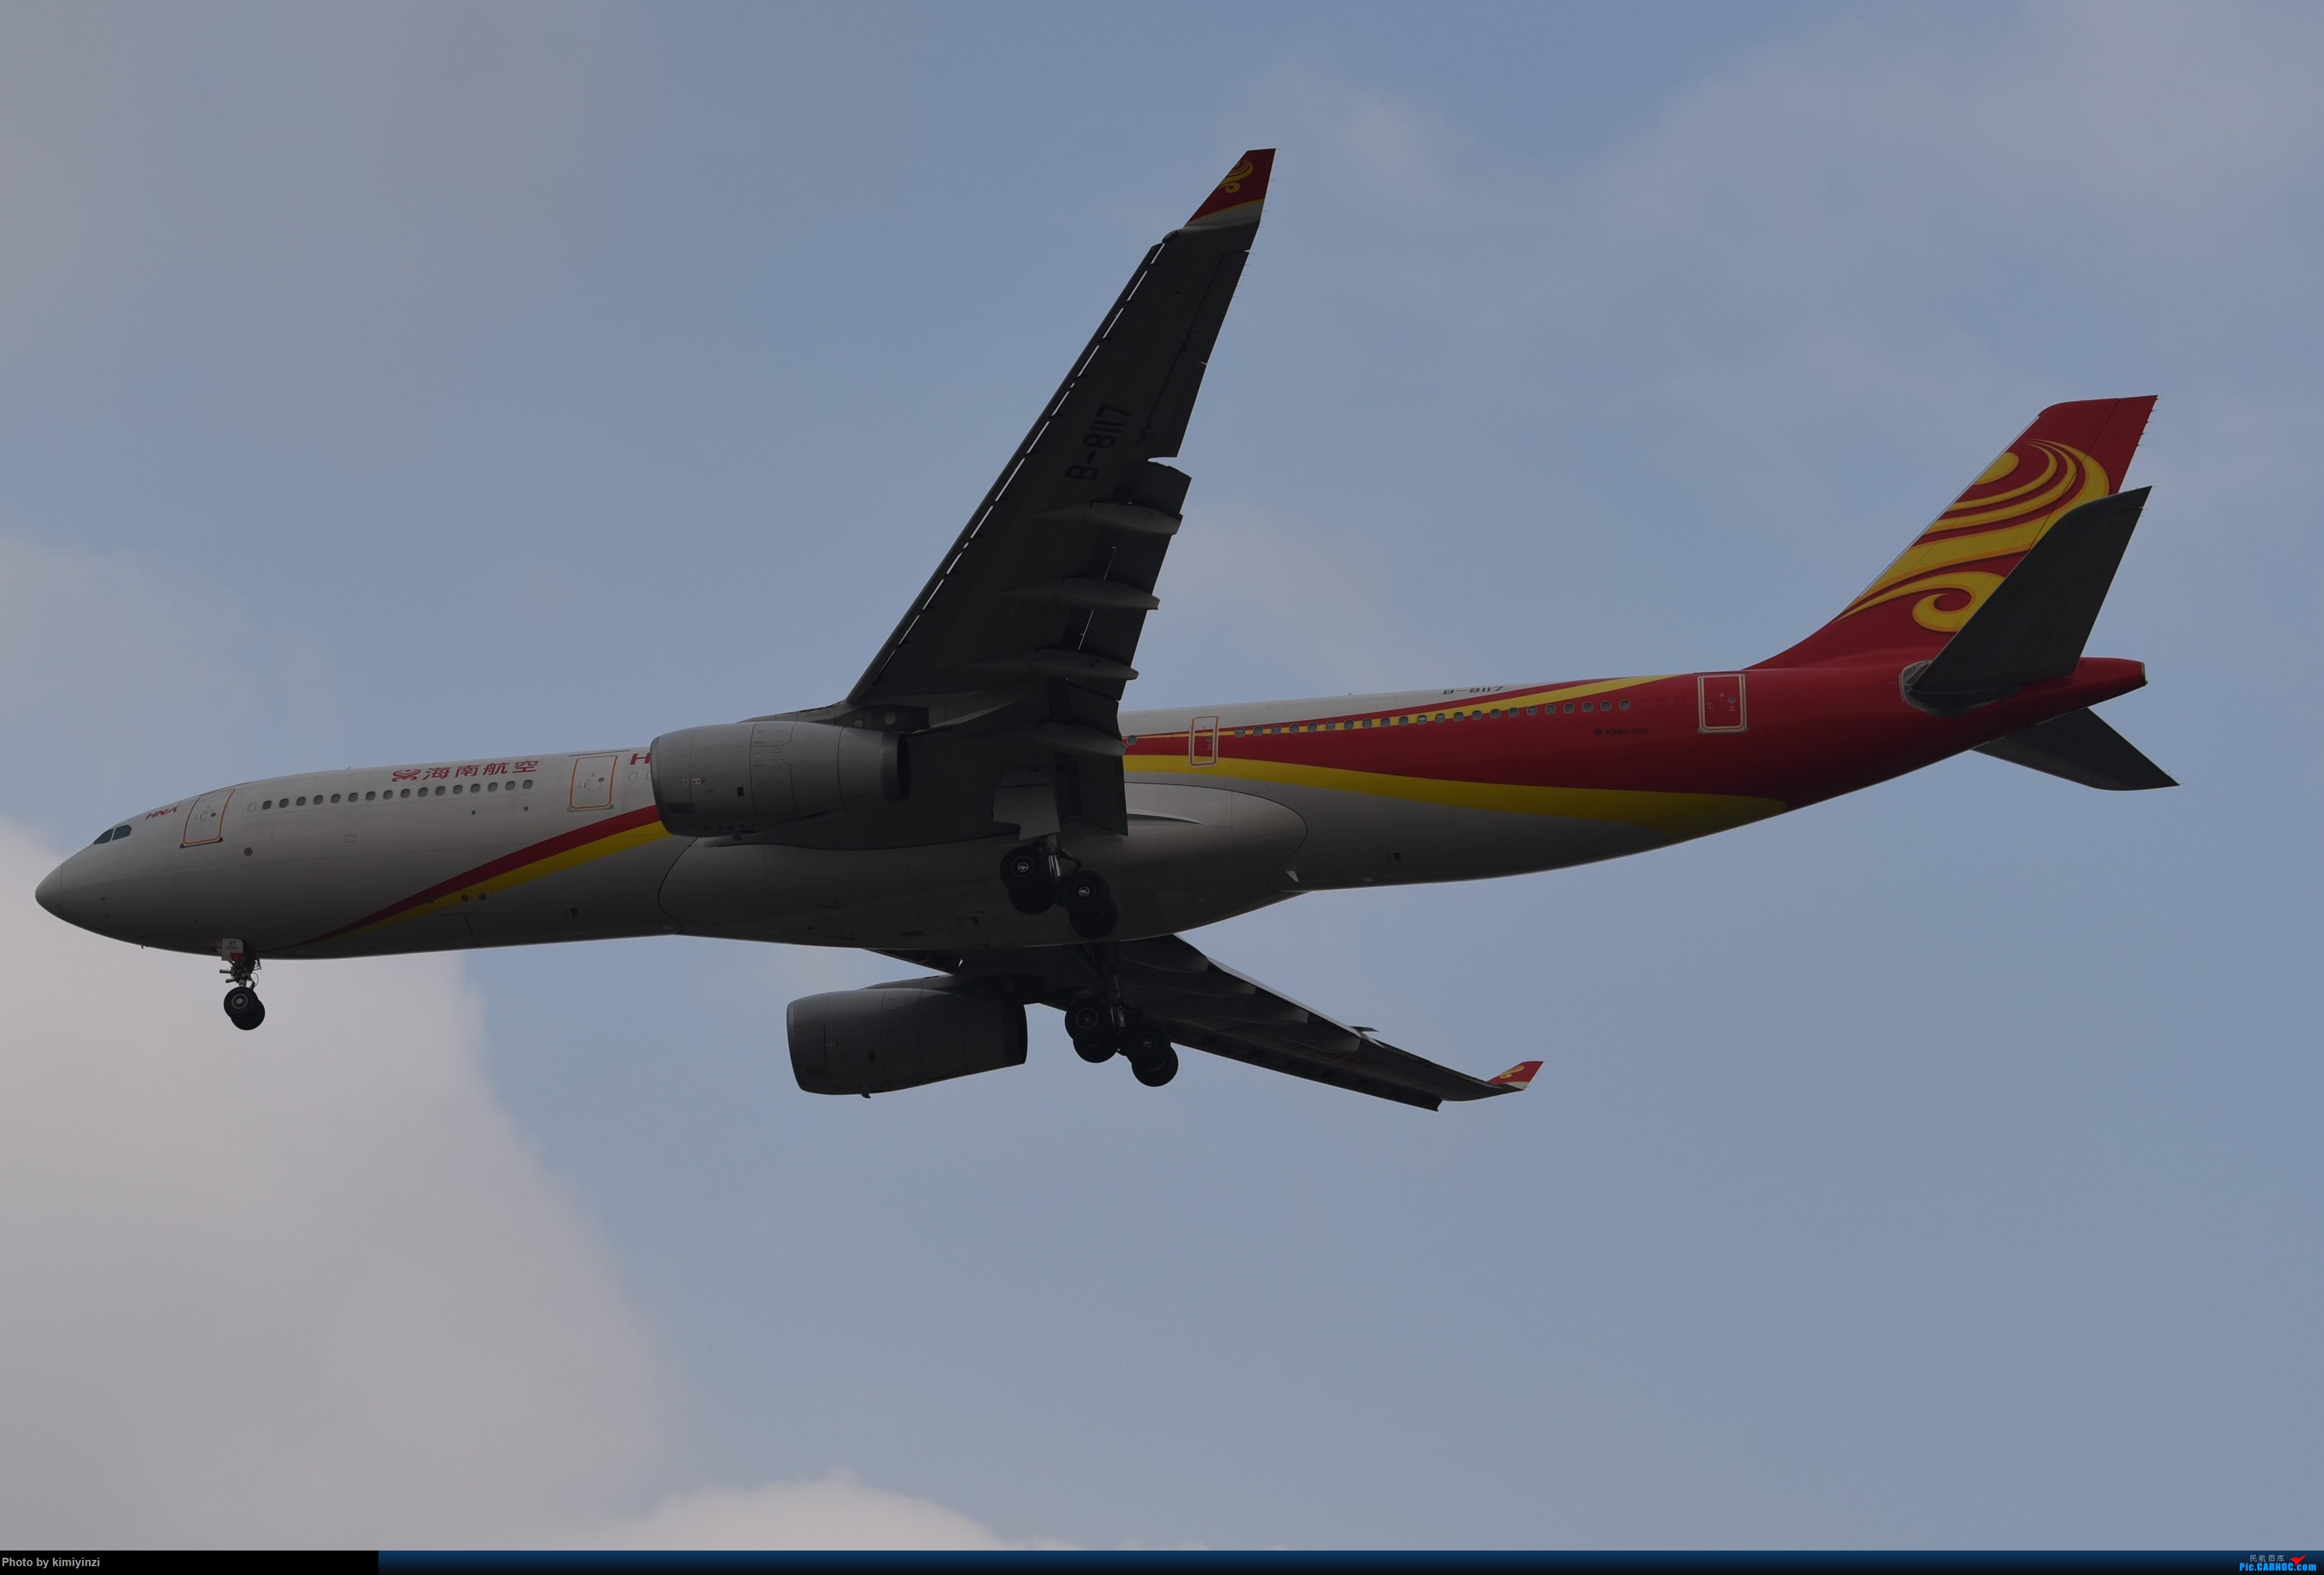 Re:[原创]KWE非常时期的贵阳龙洞堡 AIRBUS A330-300 B-8117 中国贵阳龙洞堡国际机场